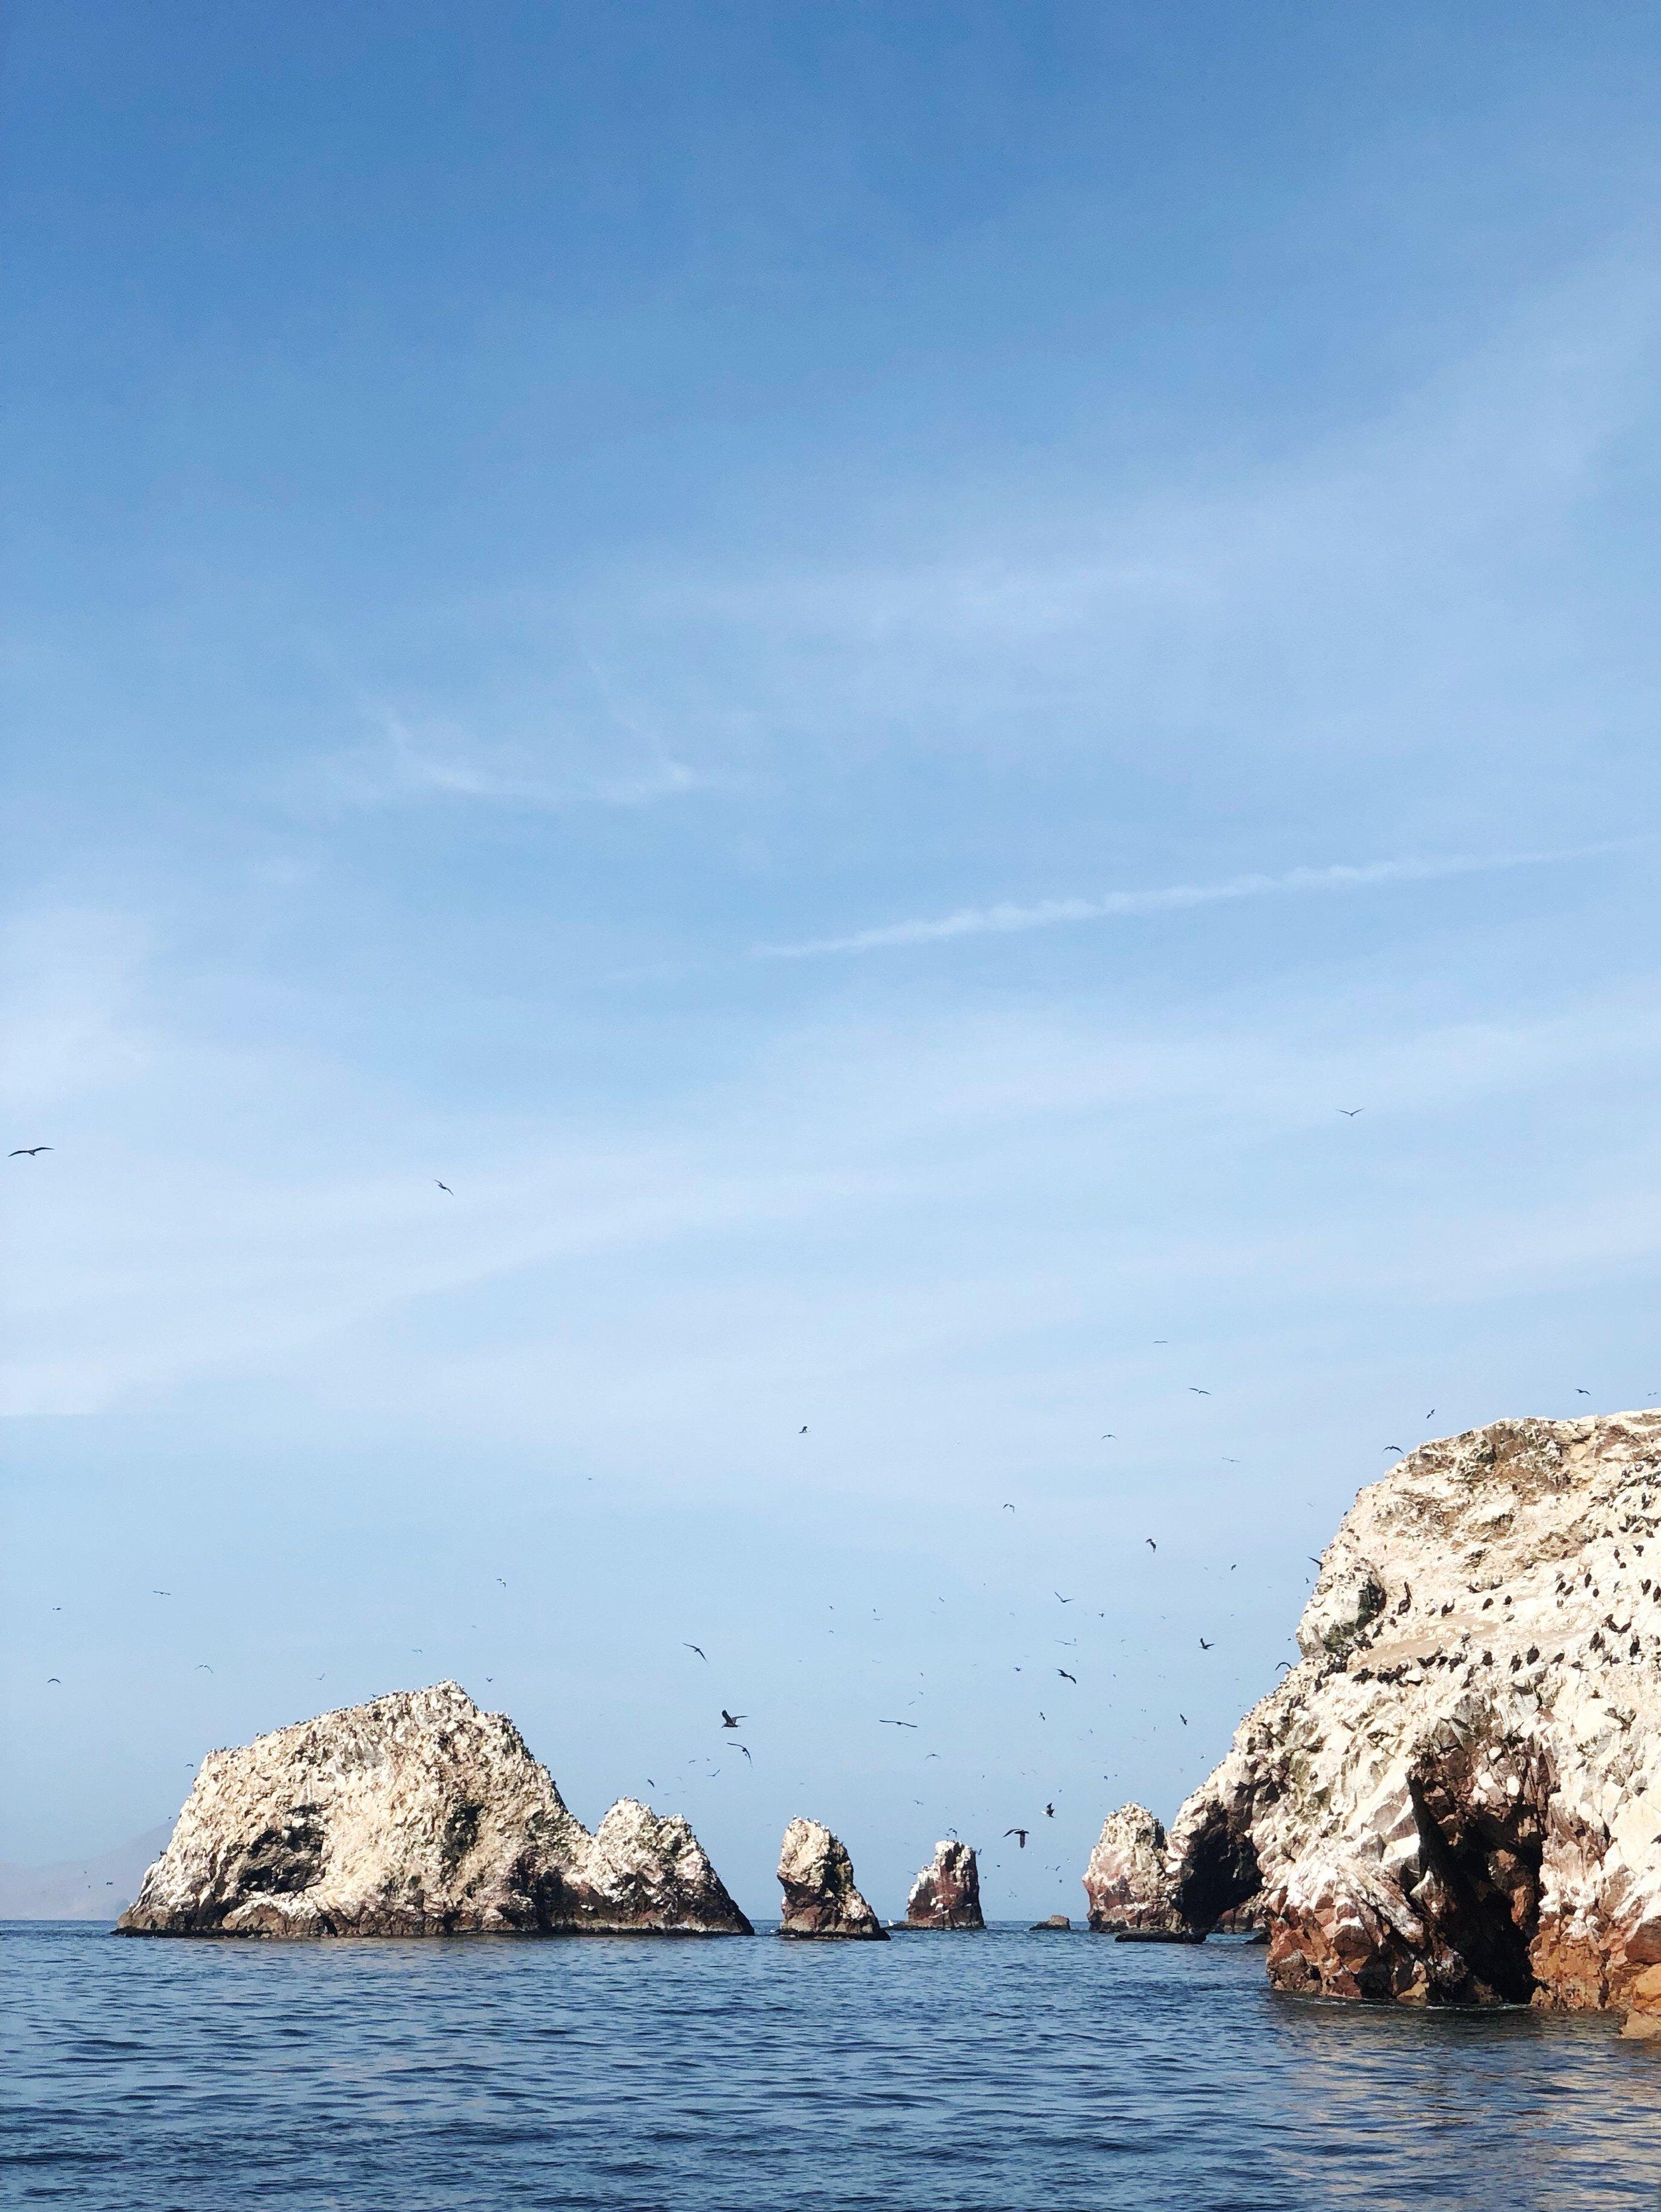 Ballestas Islands - paracas-peru - travel -tips - boat - south america